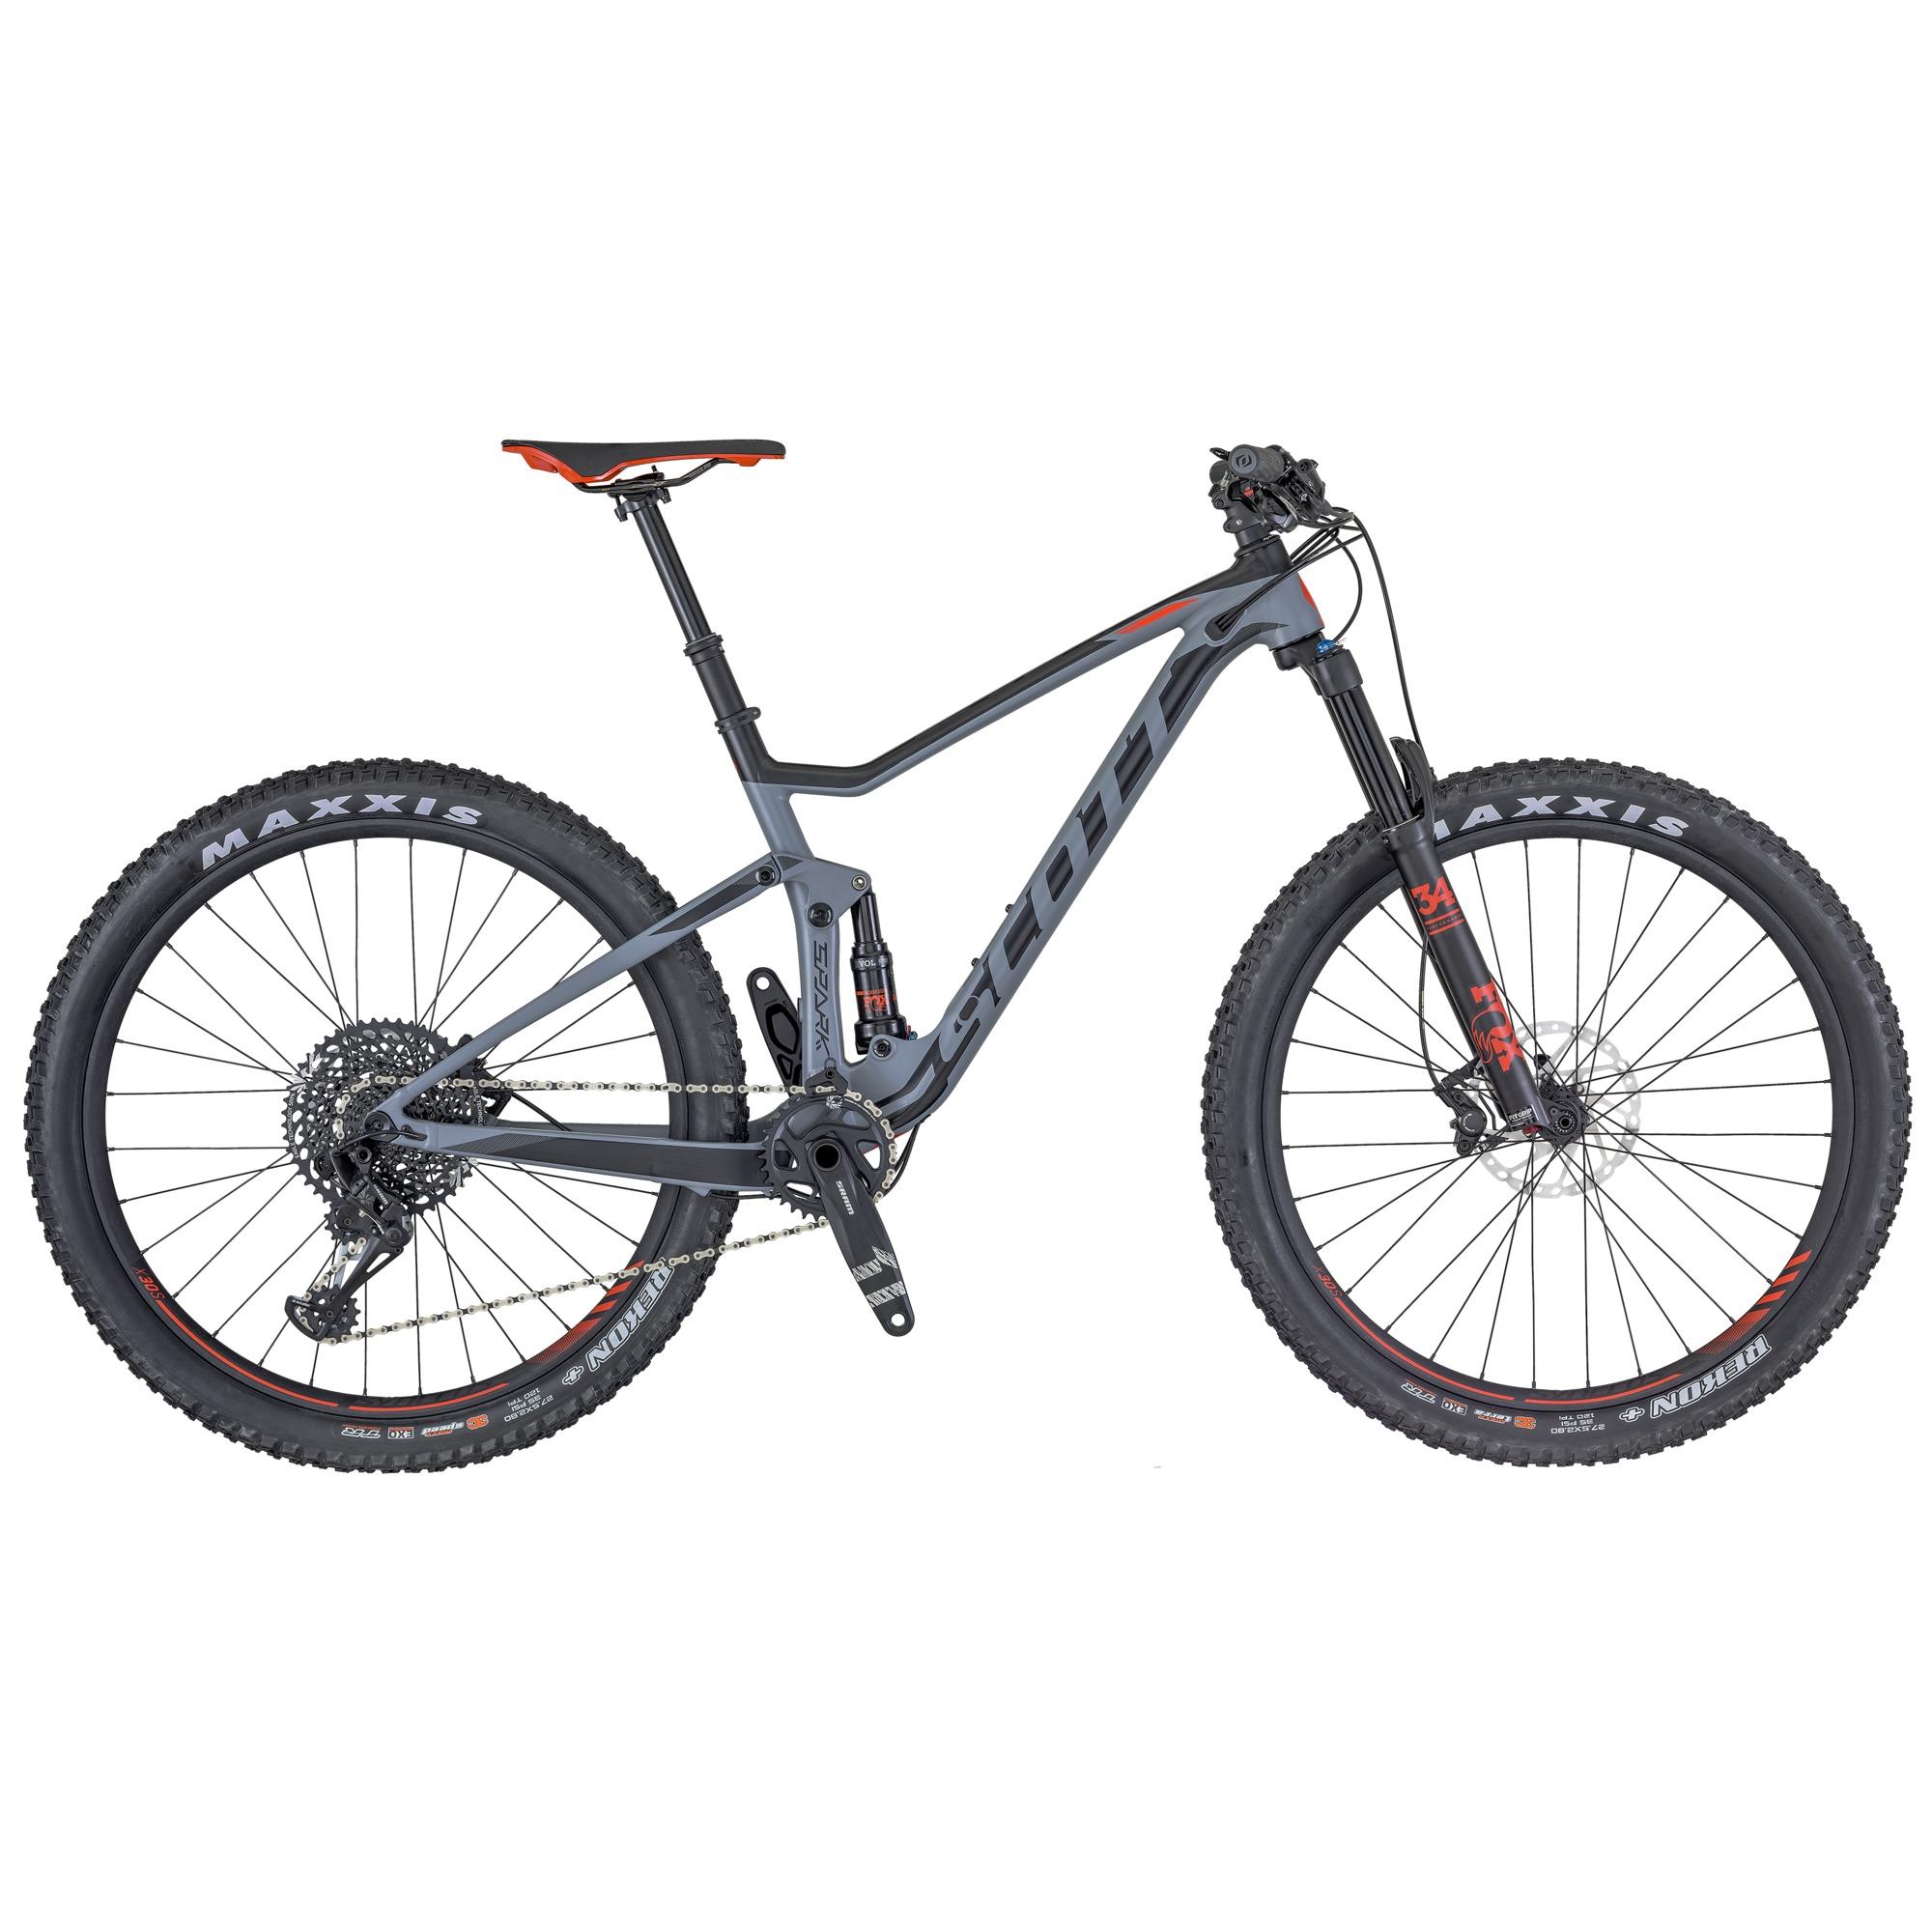 SCOTT Spark 720 Bike L - Zweirad Homann